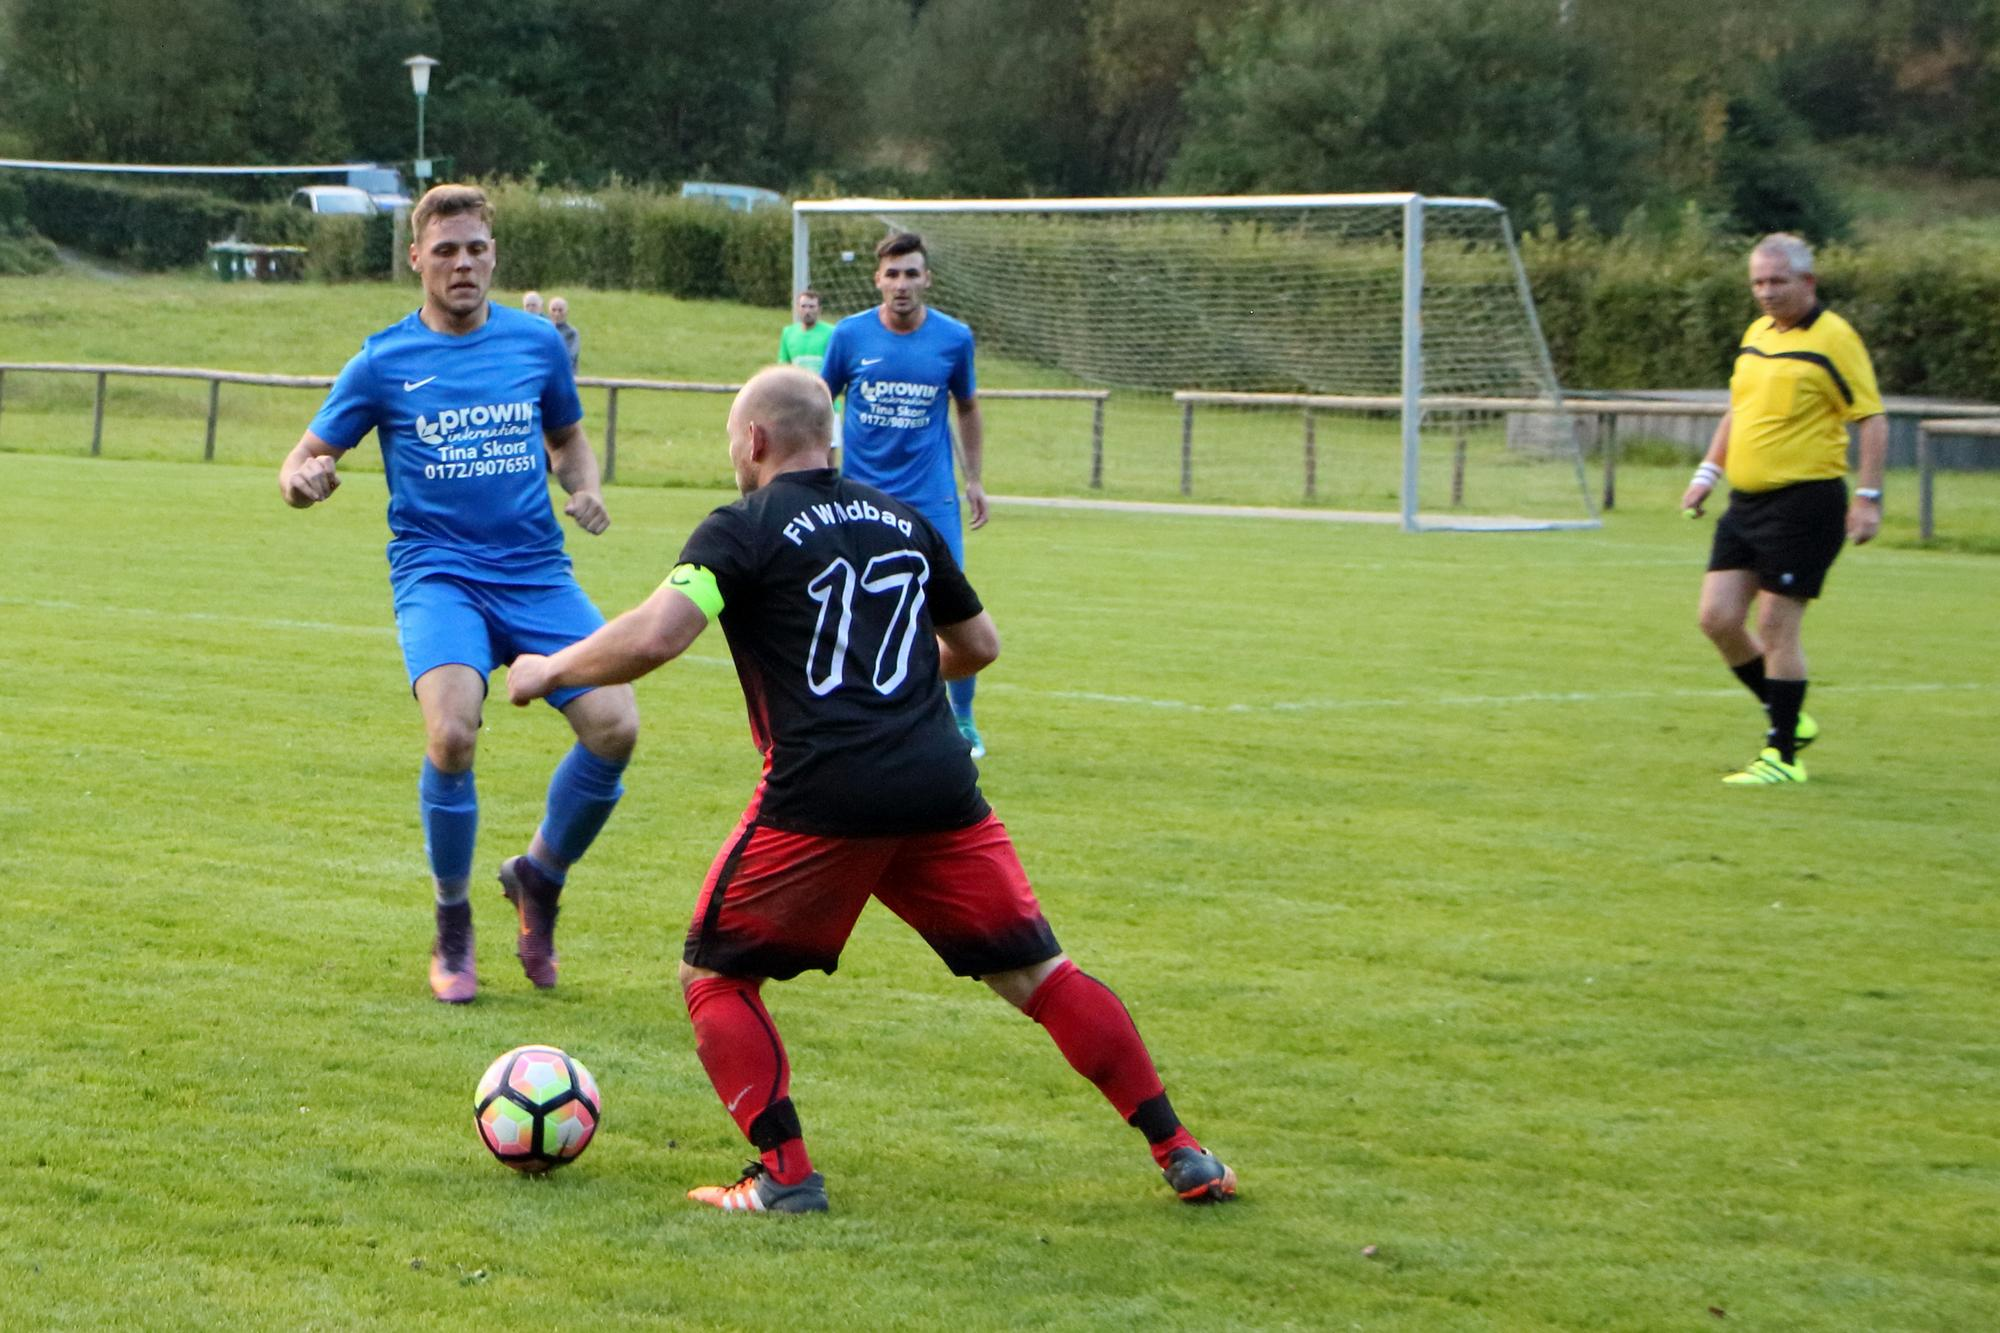 2017-09-23_VfL-Wildbad-M1_12